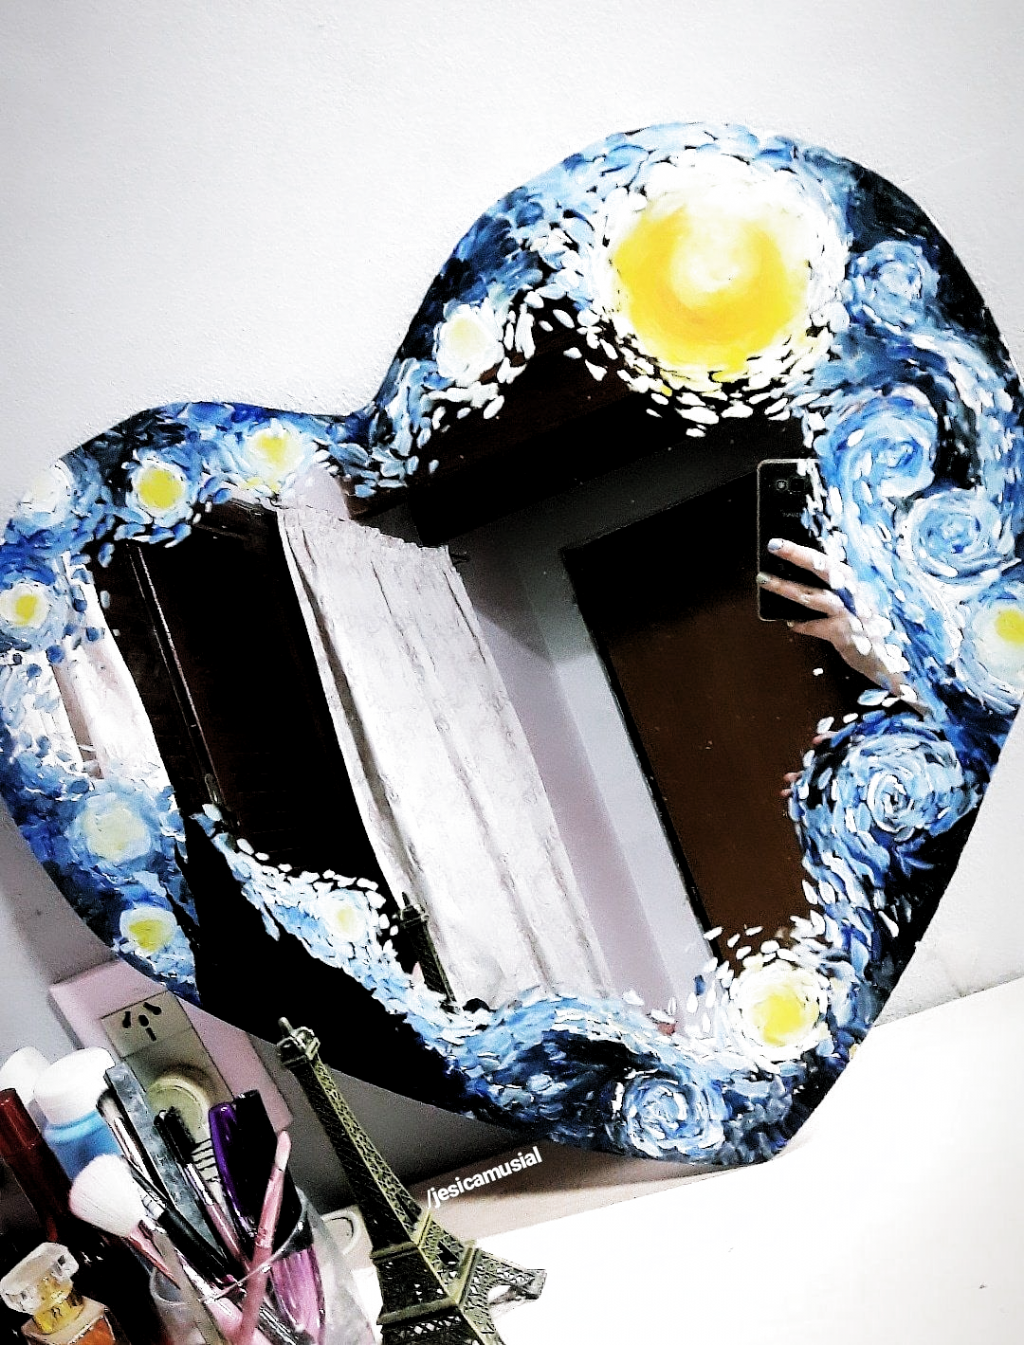 Pin De Agus Gimenez En Deco Pintura De Espejos Espejos Pintados Dibujos Para Arte